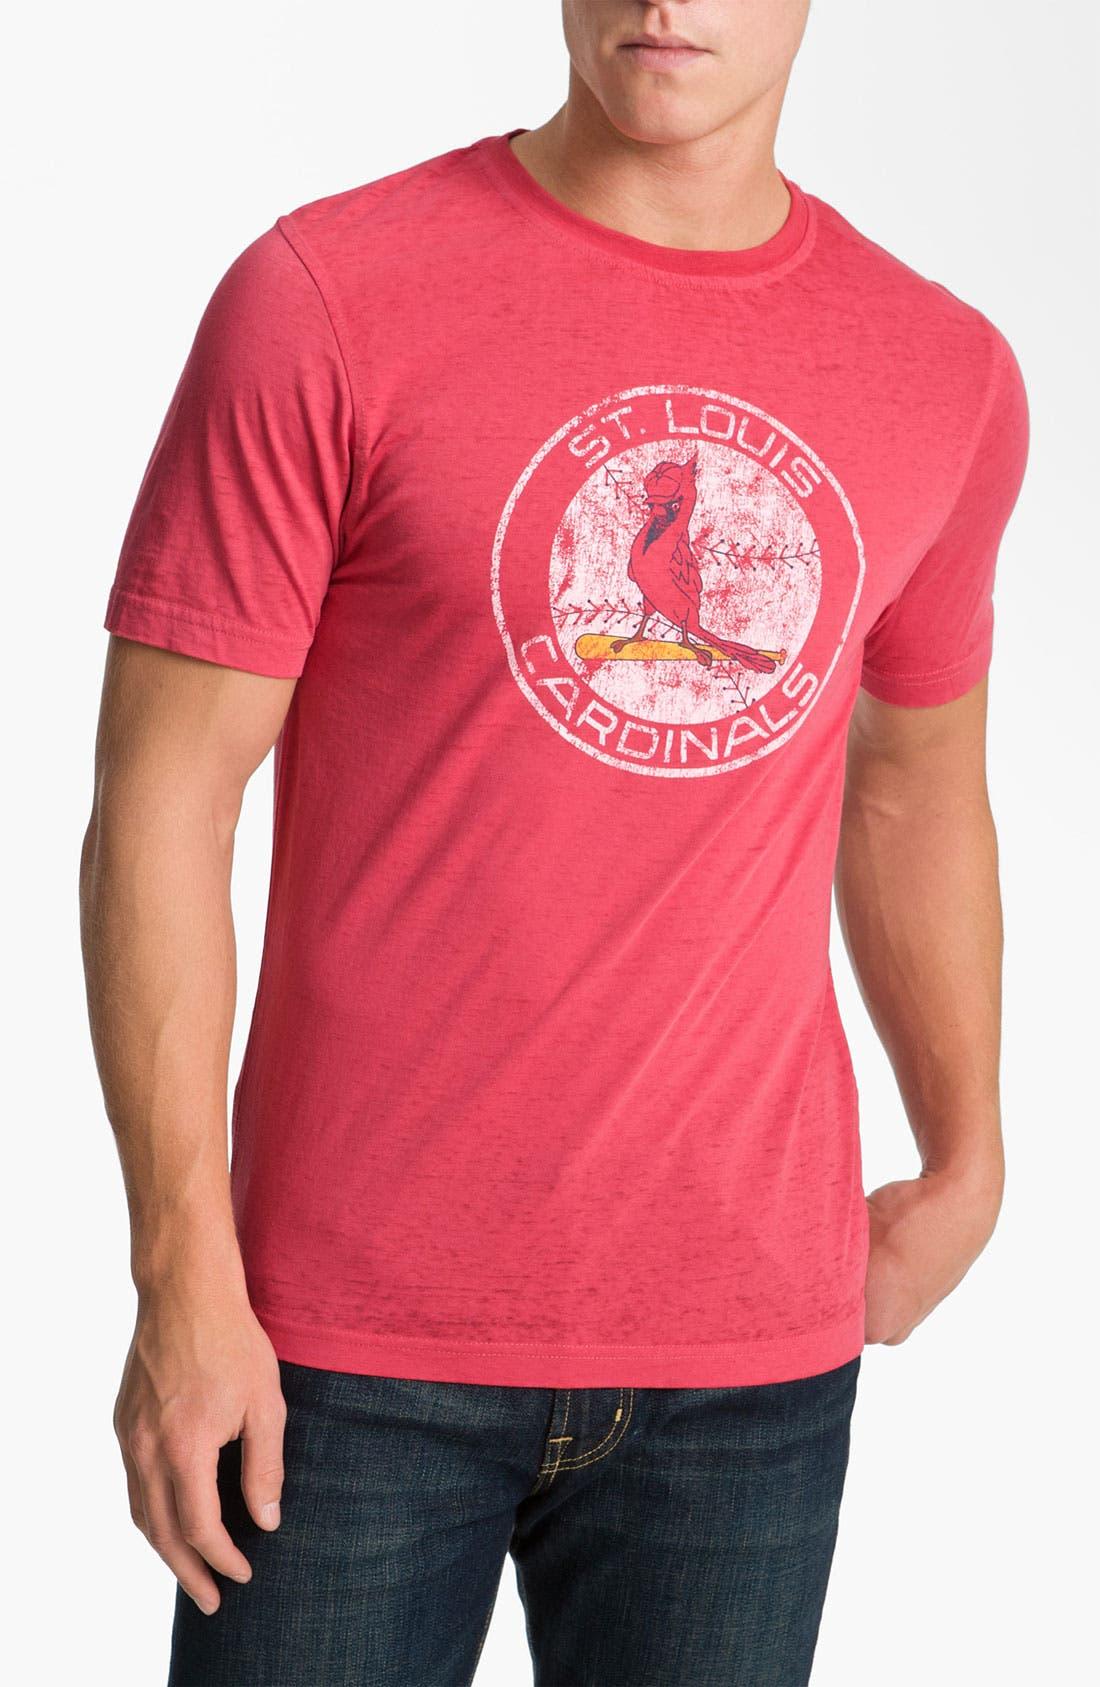 Main Image - Red Jacket 'Cardinals - Greenwood' T-Shirt